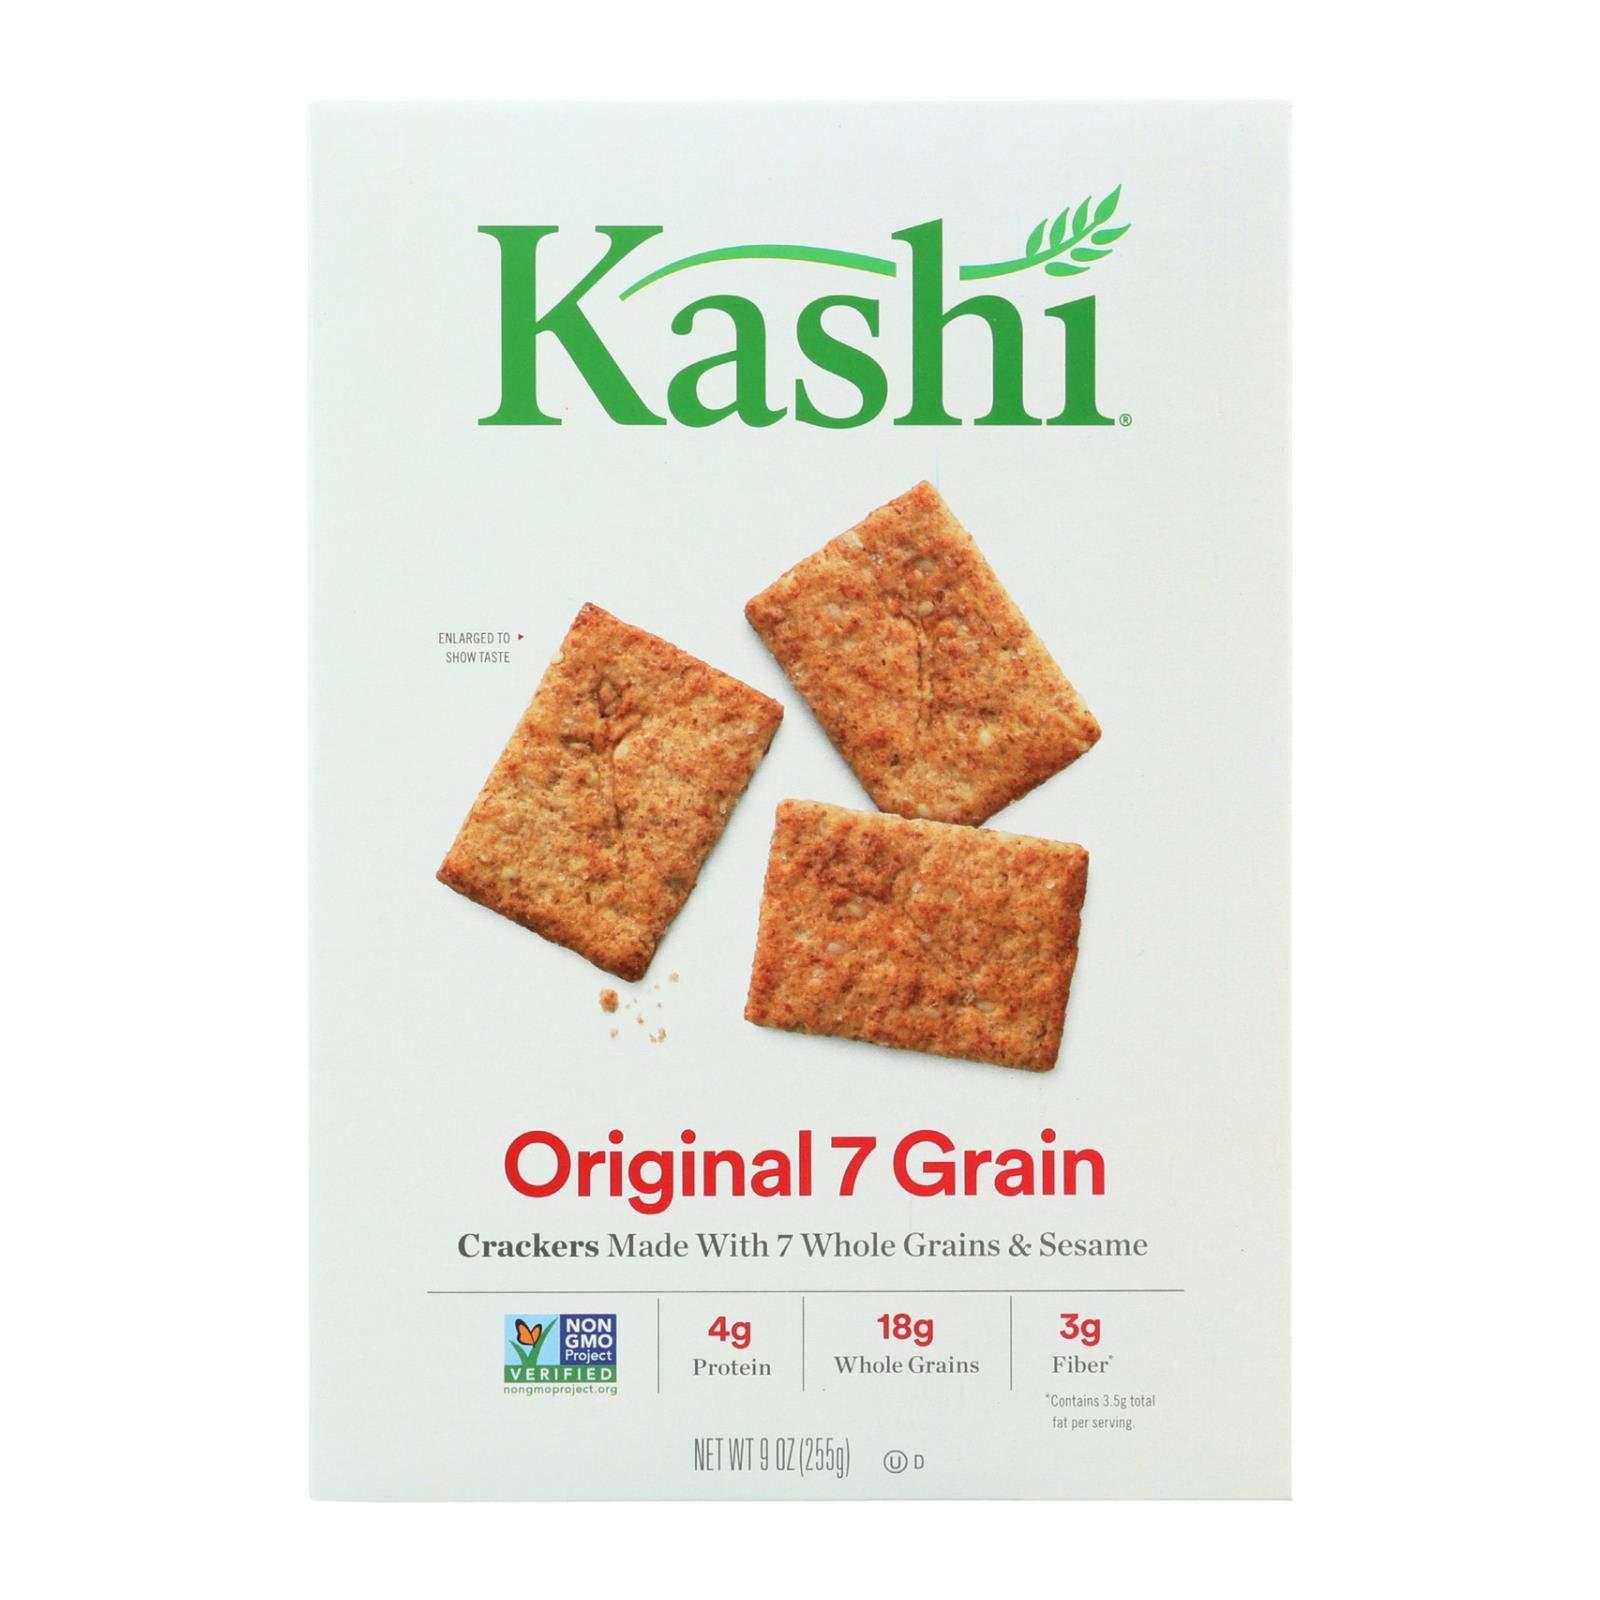 Kashi Crackers Original 7 Grain - Case of 12 - 9 oz.